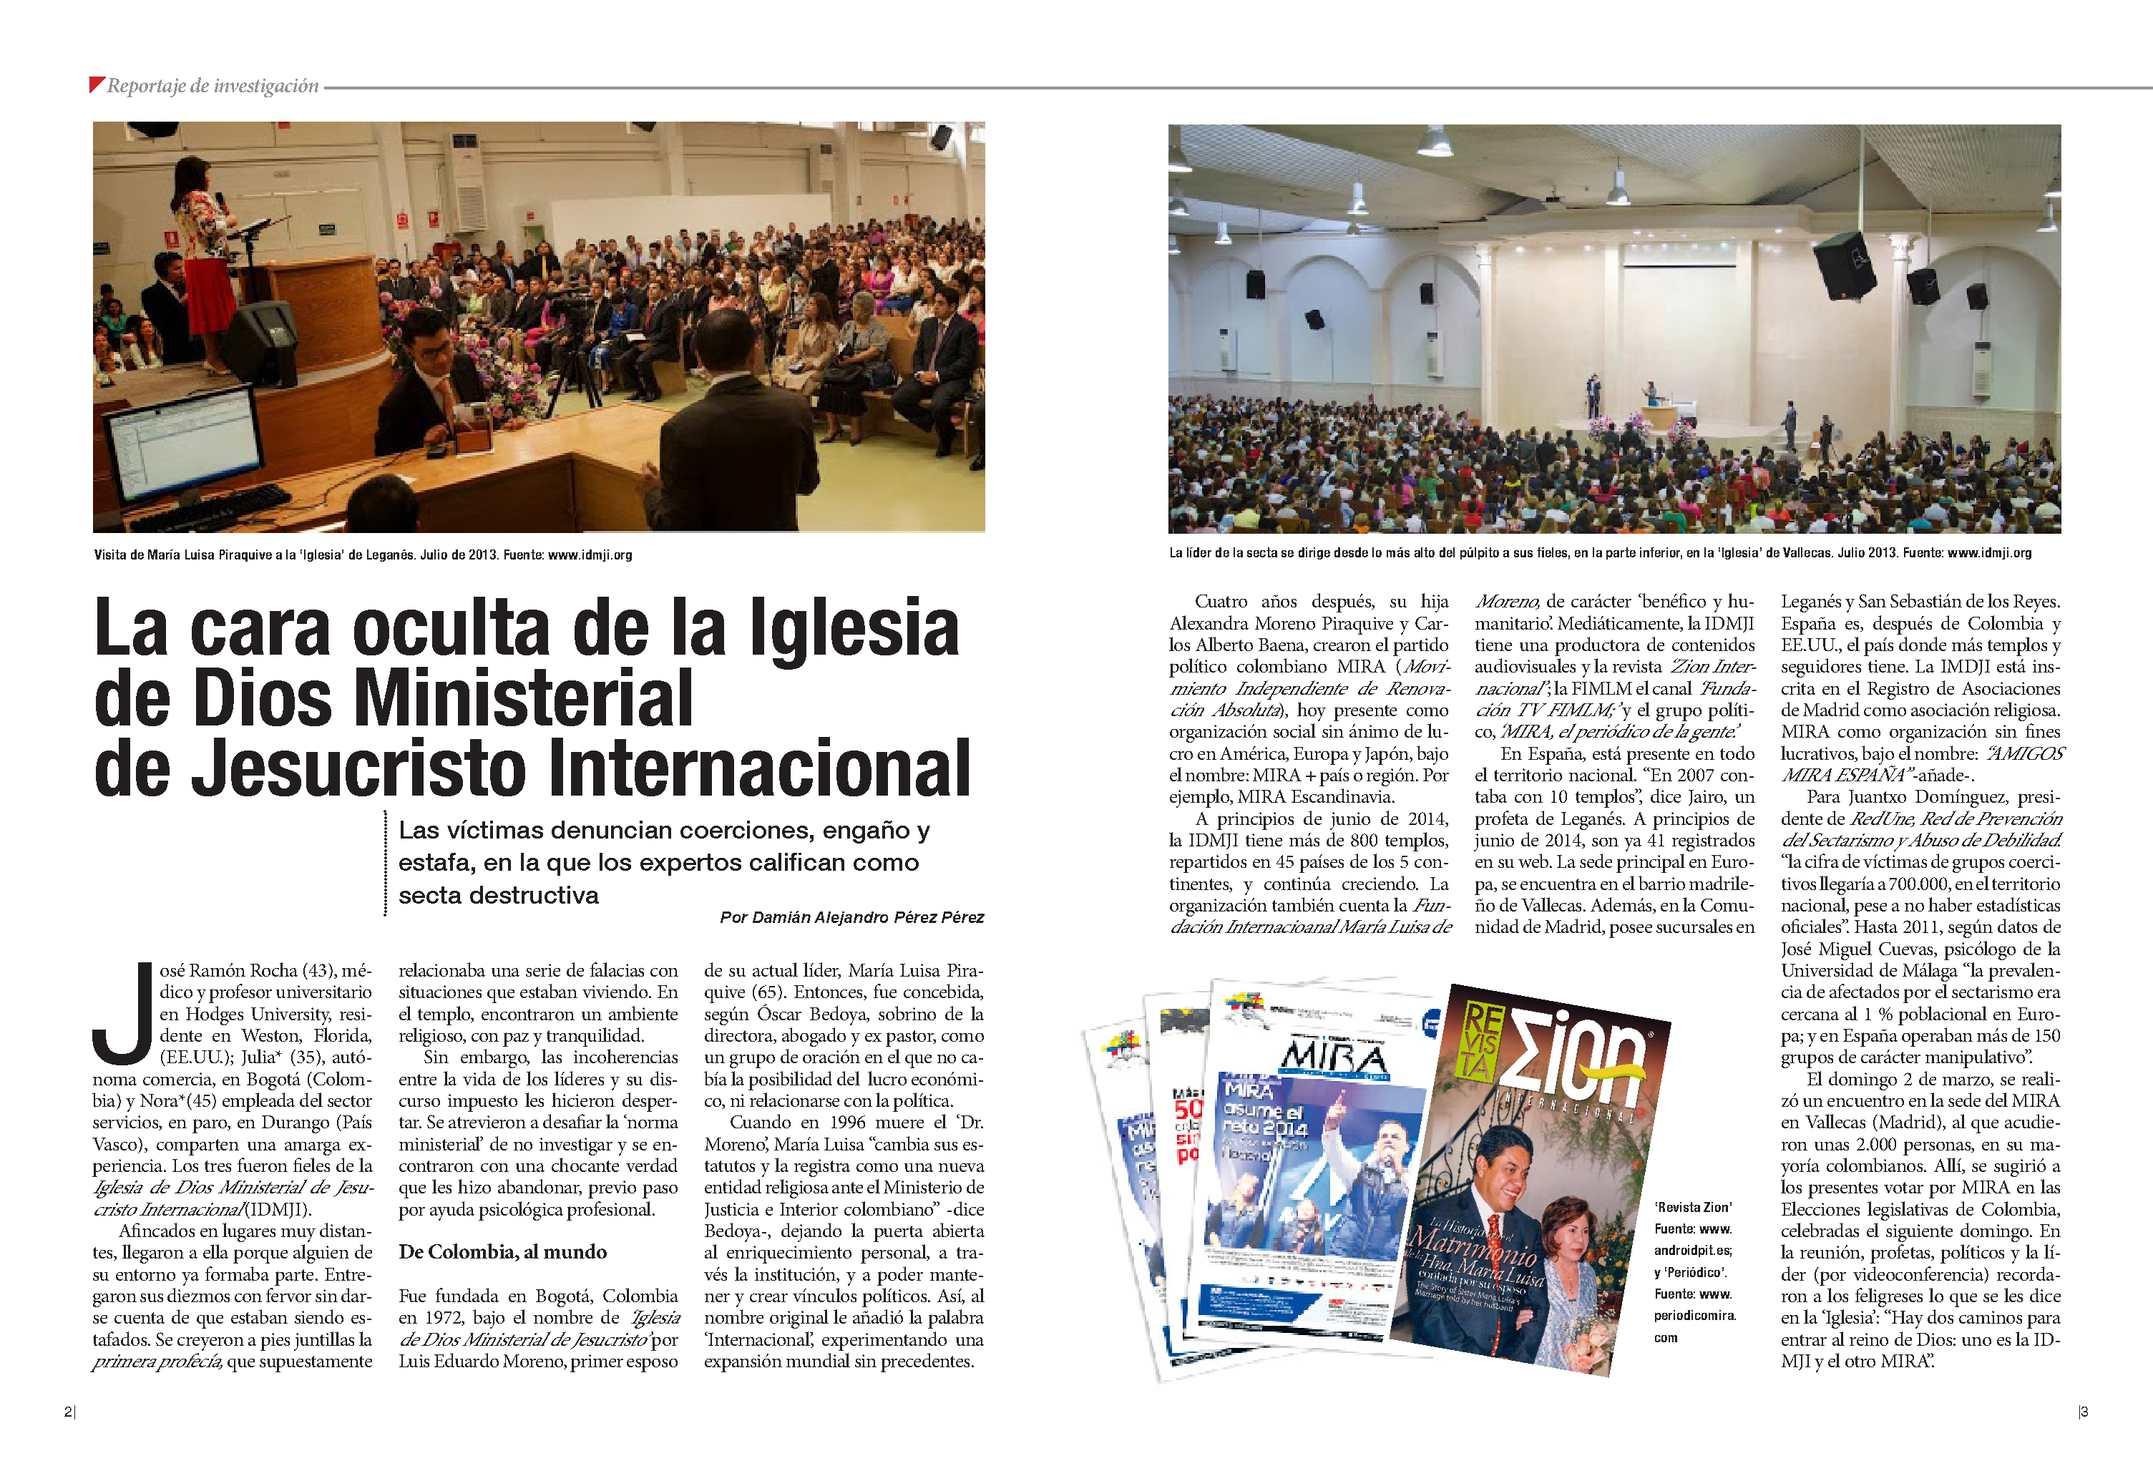 La cara oculta de la Iglesia  de Dios Ministerial  de Jesucristo Internacional